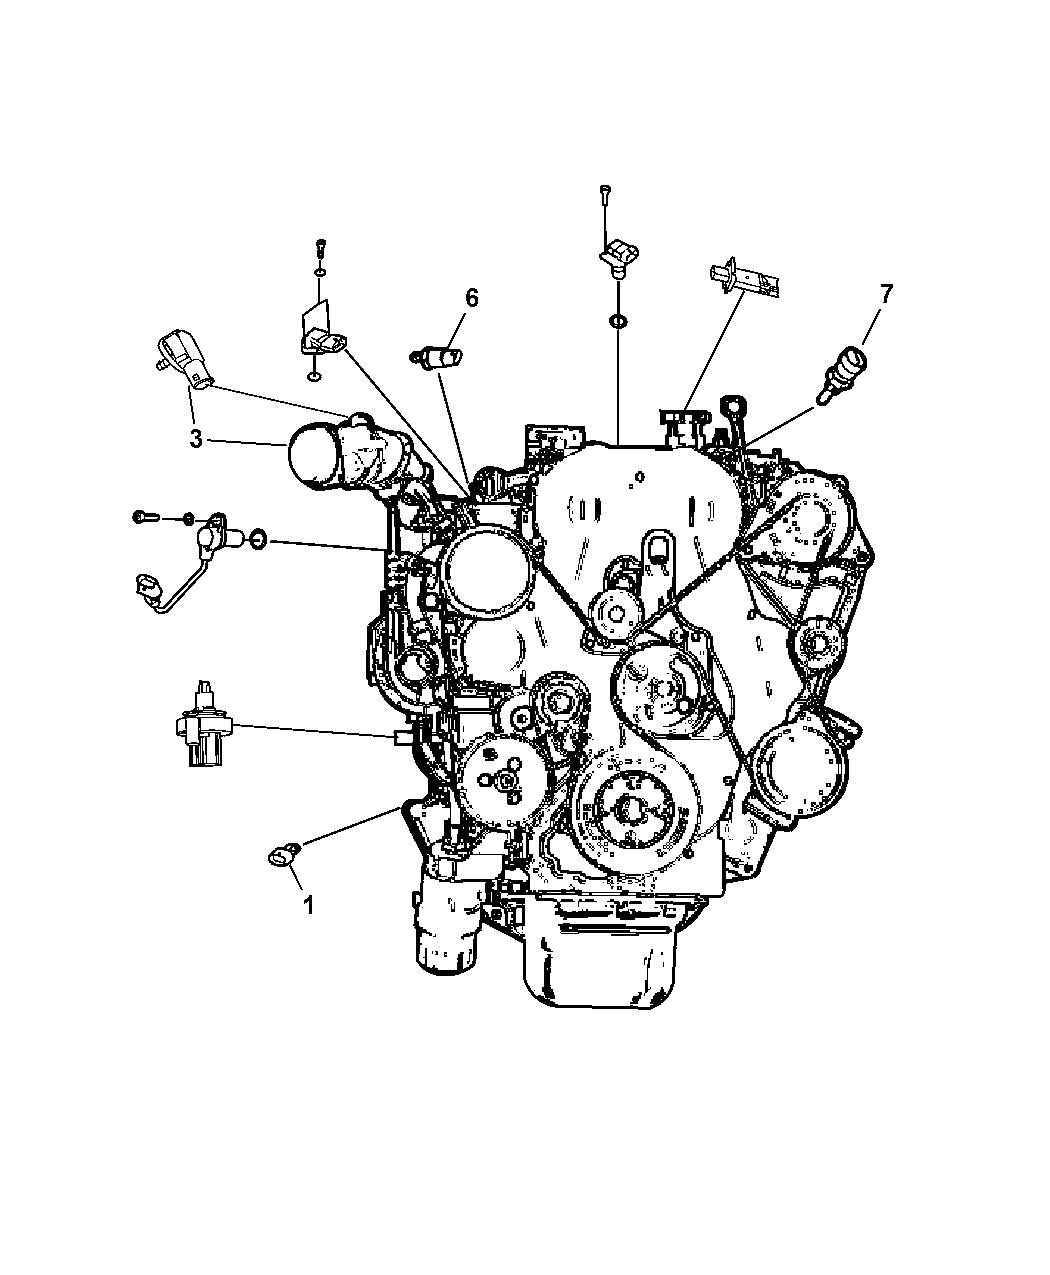 2007 Dodge Caliber Sensors Engine Mopar Parts Giant Wiring Schematic Starting Thumbnail 2